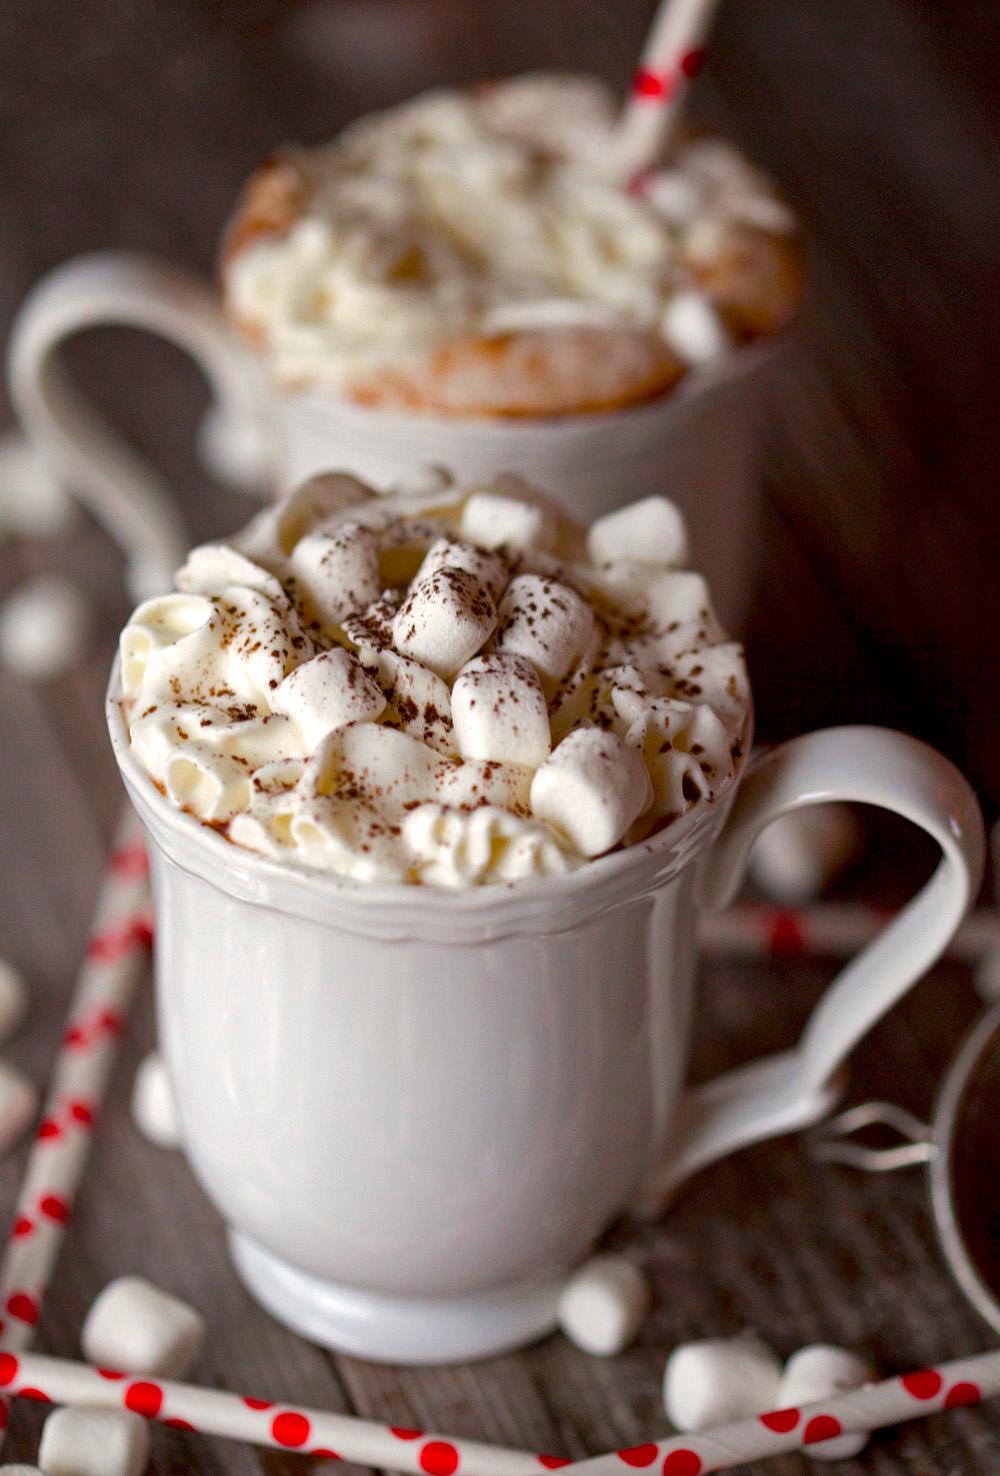 Cute Coffee Mug Wallpaper Sipping Hot Chocolate